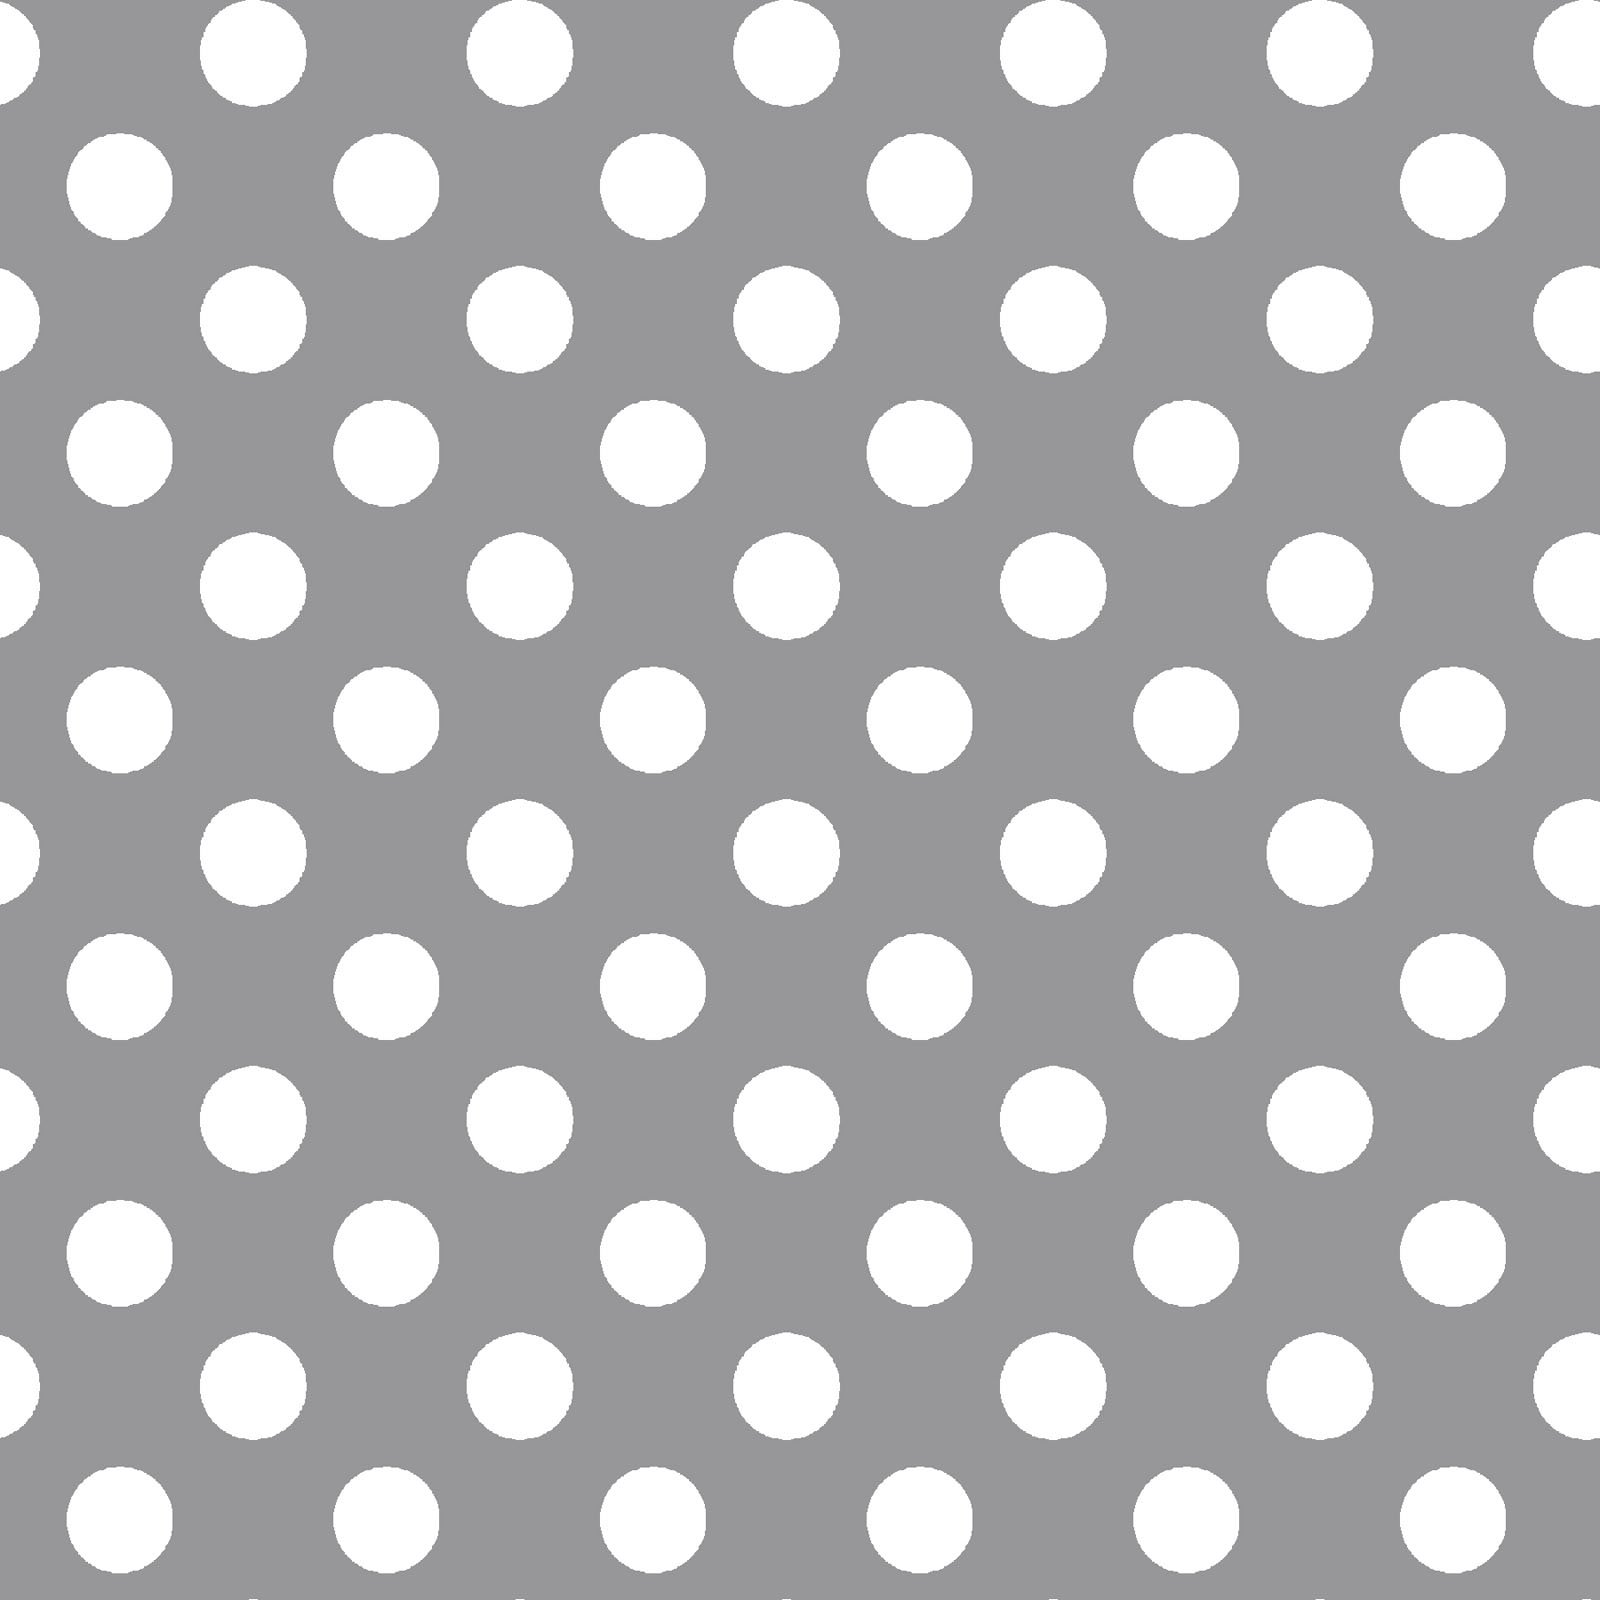 KimberBell Basics Grey Dots 8216M-K